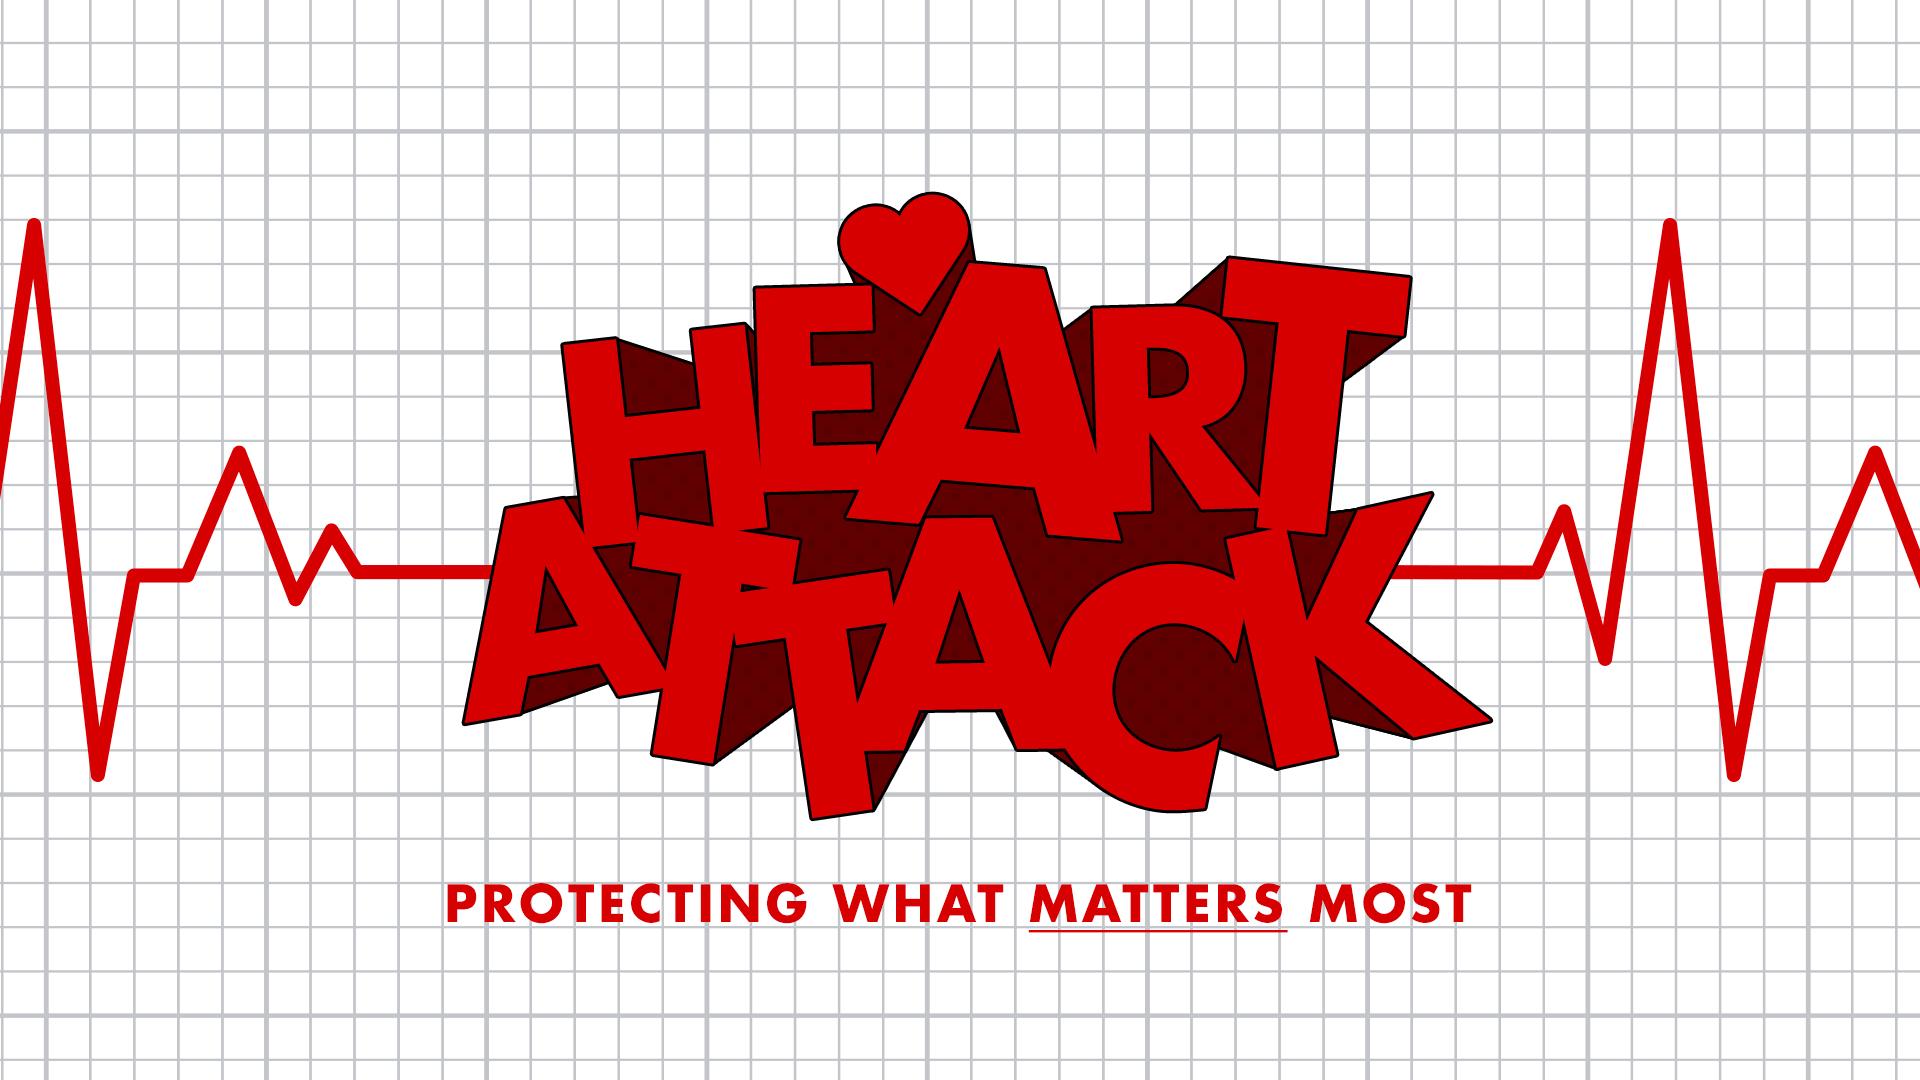 HeartAttack_1920x1080 (1).jpg